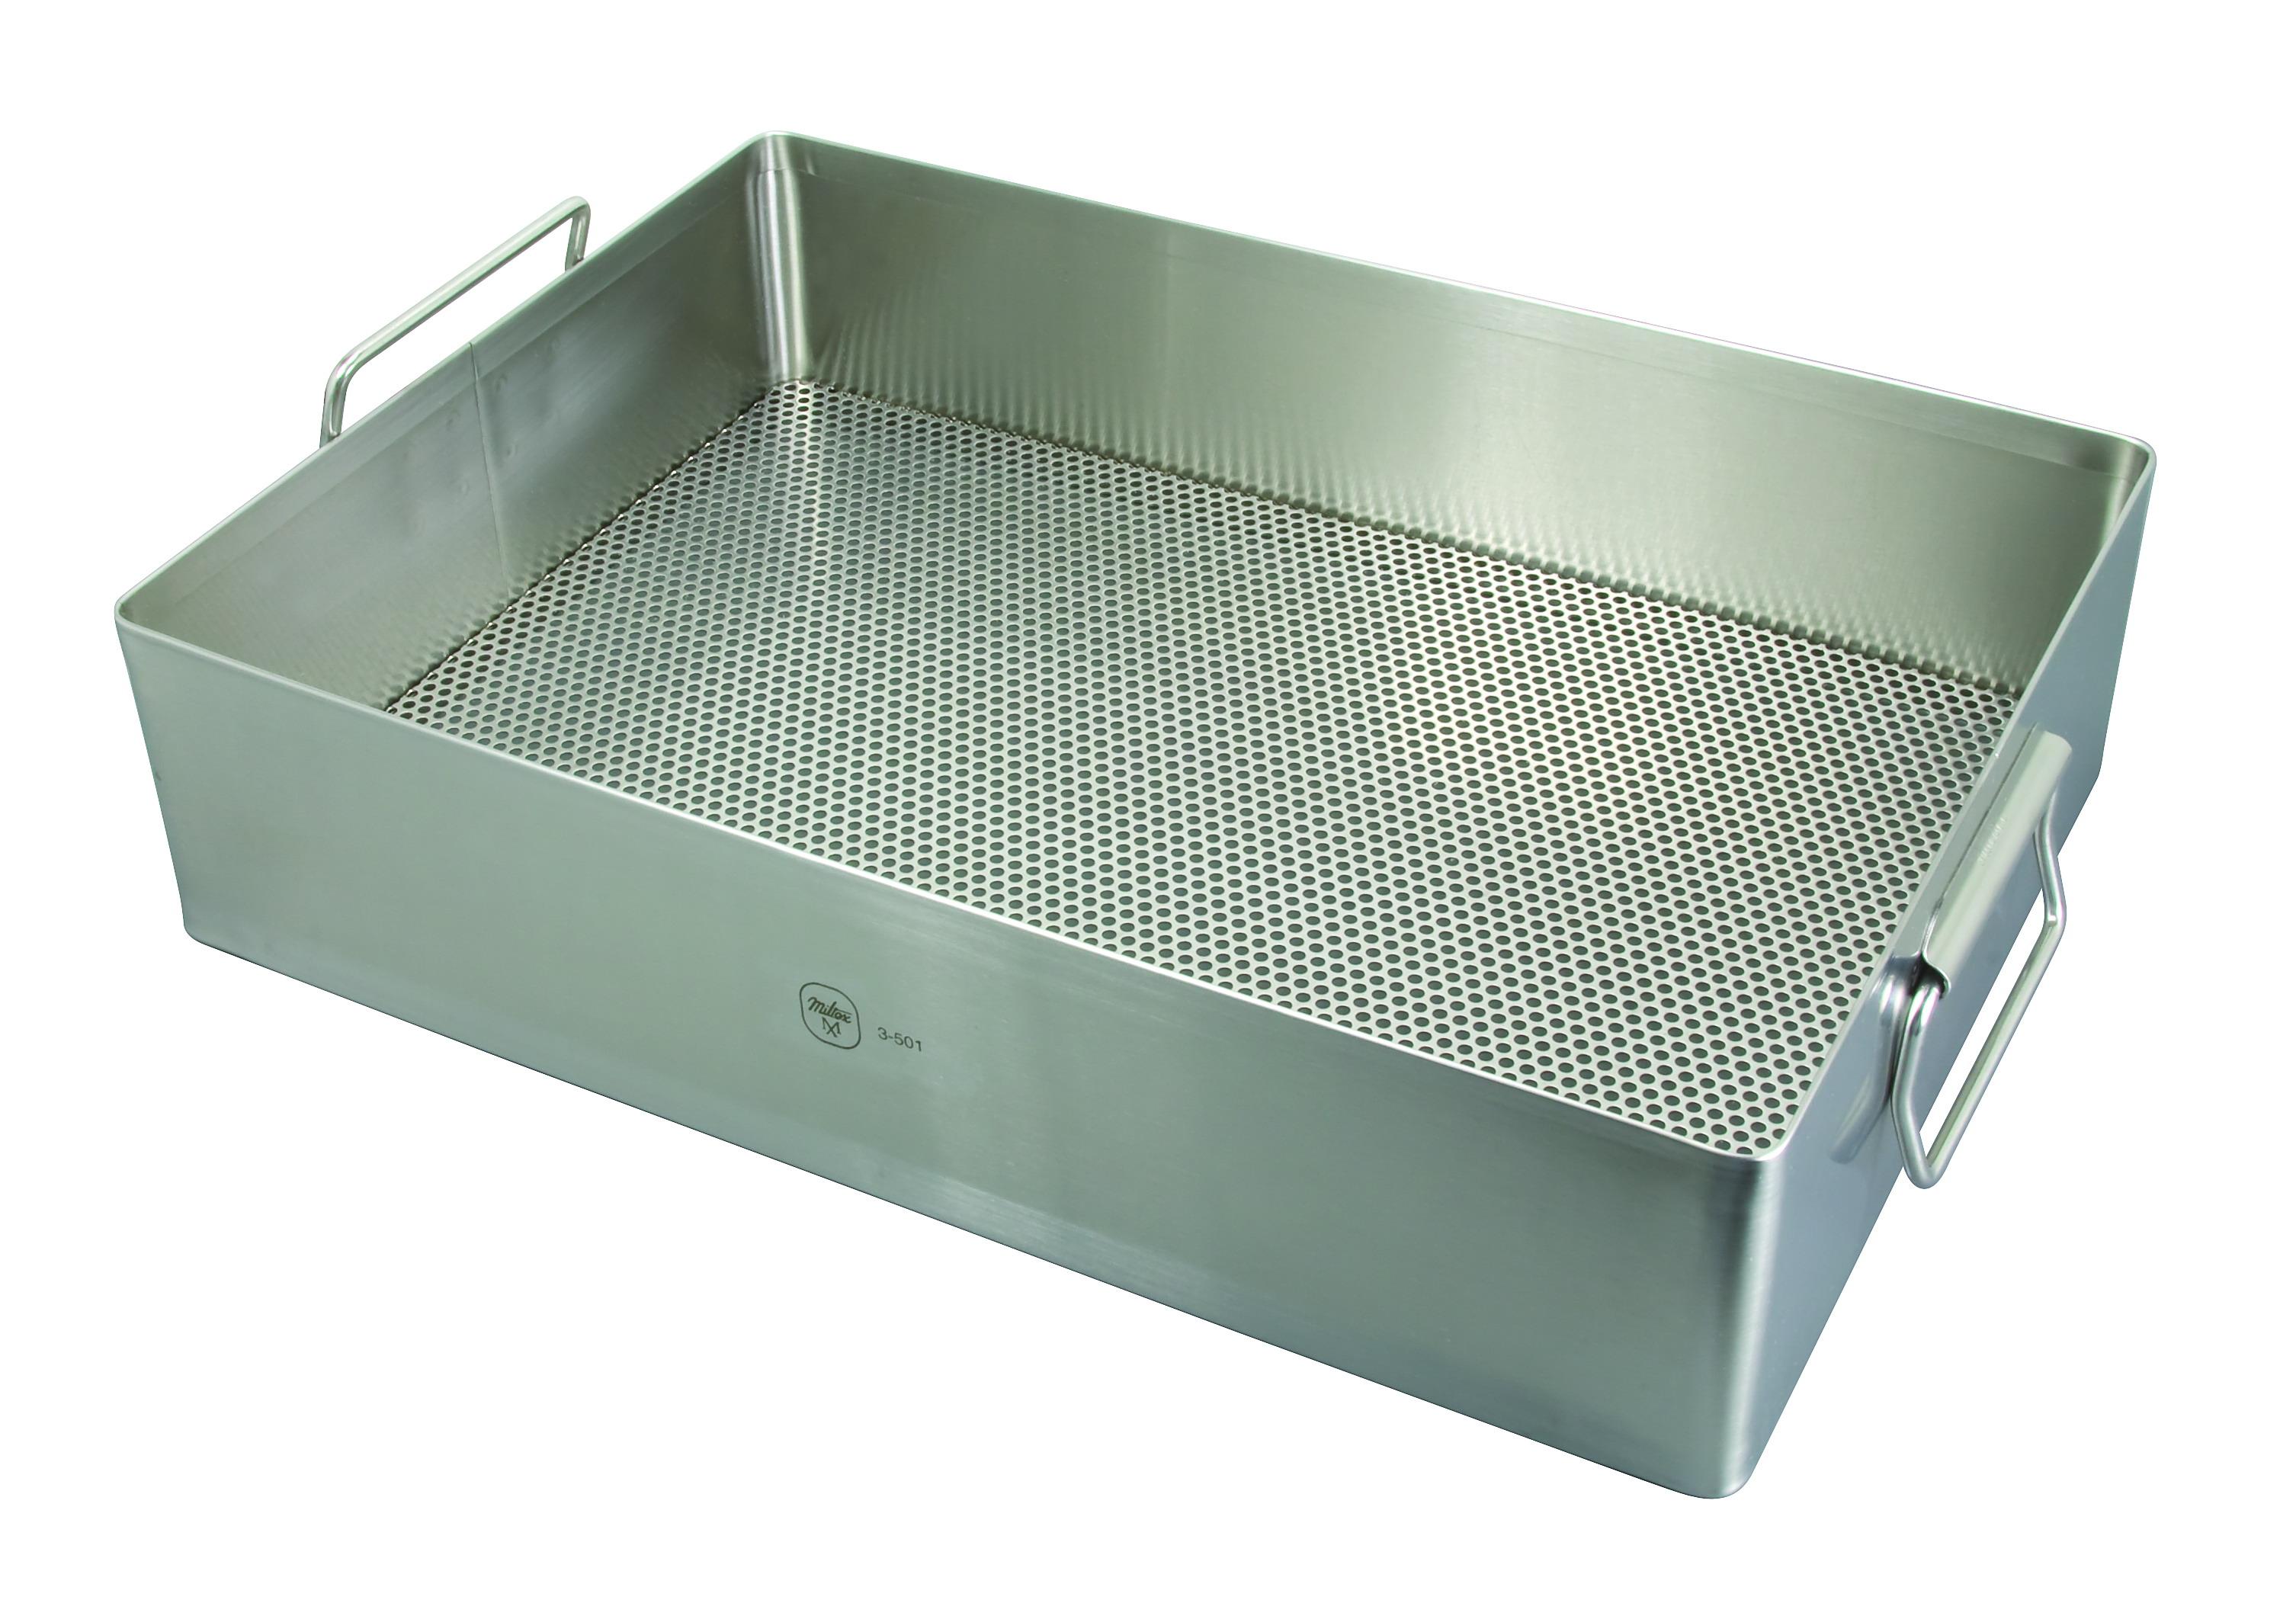 instrument-sterilizing-tray-15-x-10-1-2-x-3-1-2-381-x-26-x-89-cm-3-501-miltex.jpg